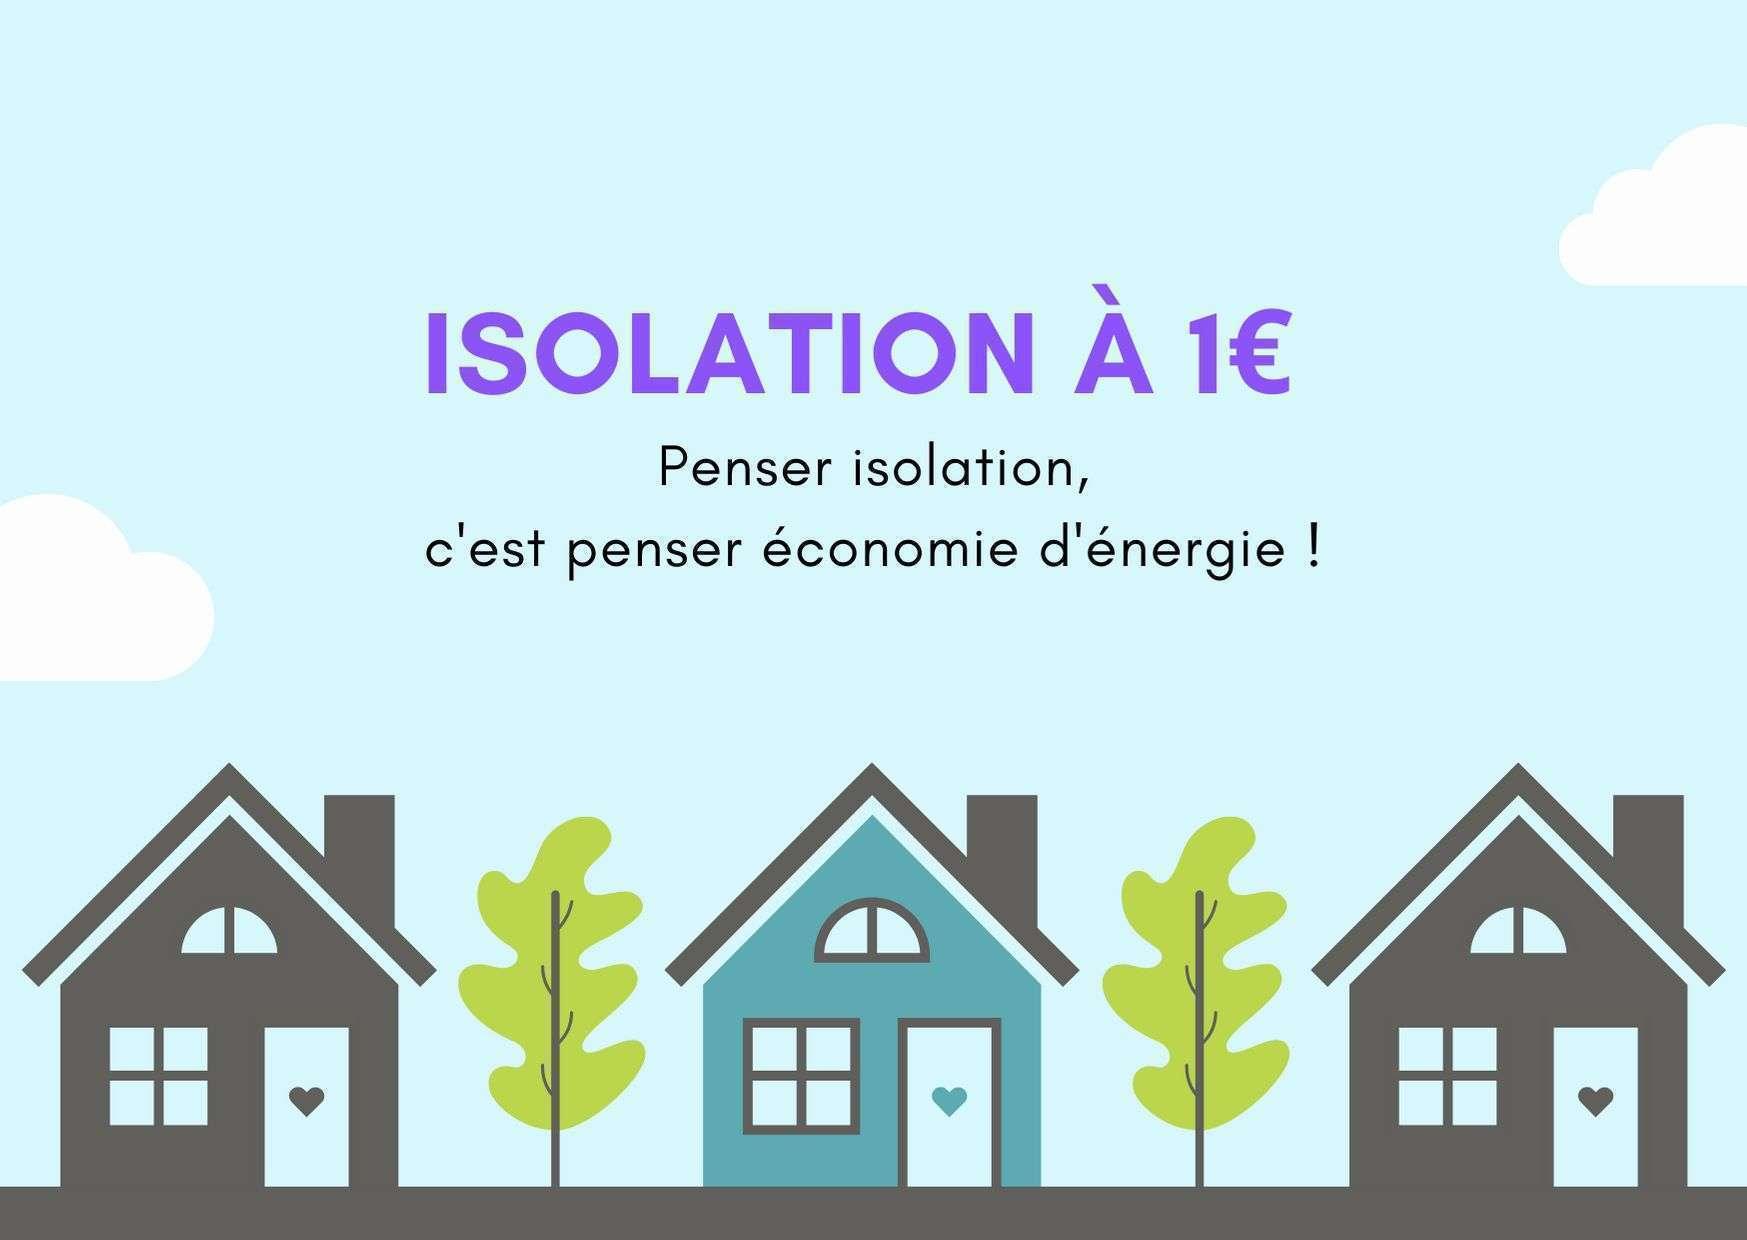 Isolation à 1€